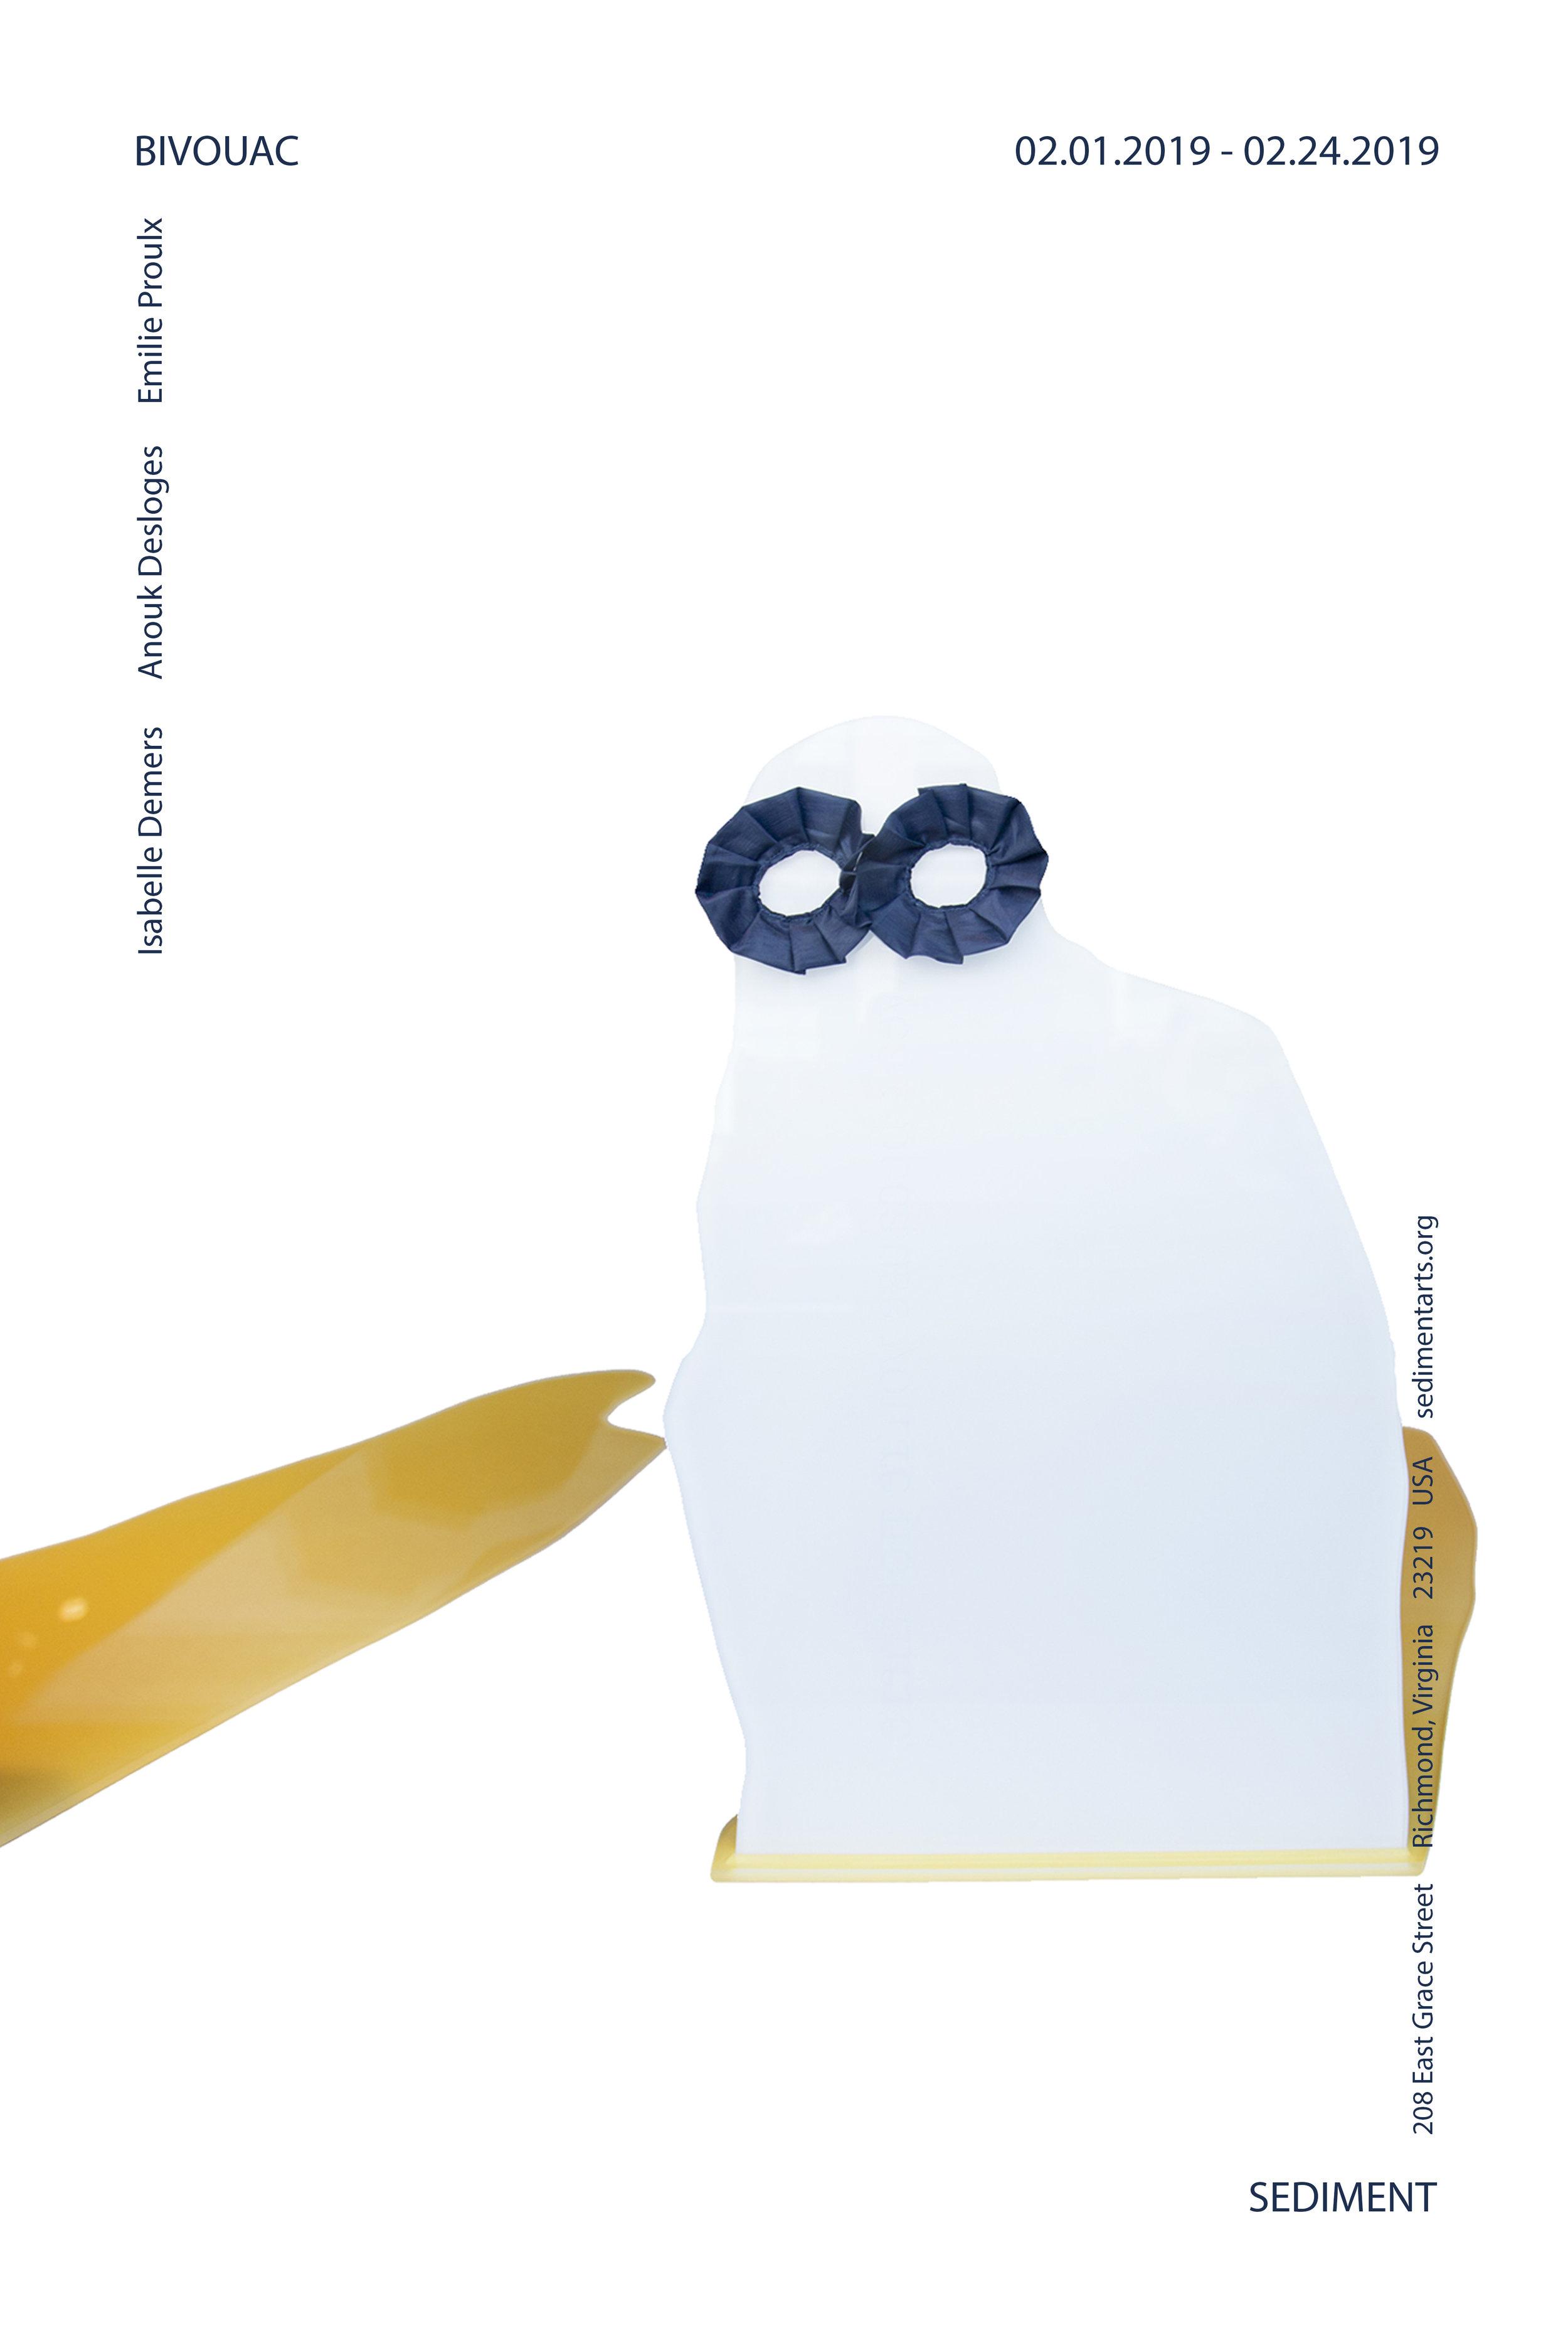 SEDIMENT-BIVOUAC-poster.jpg